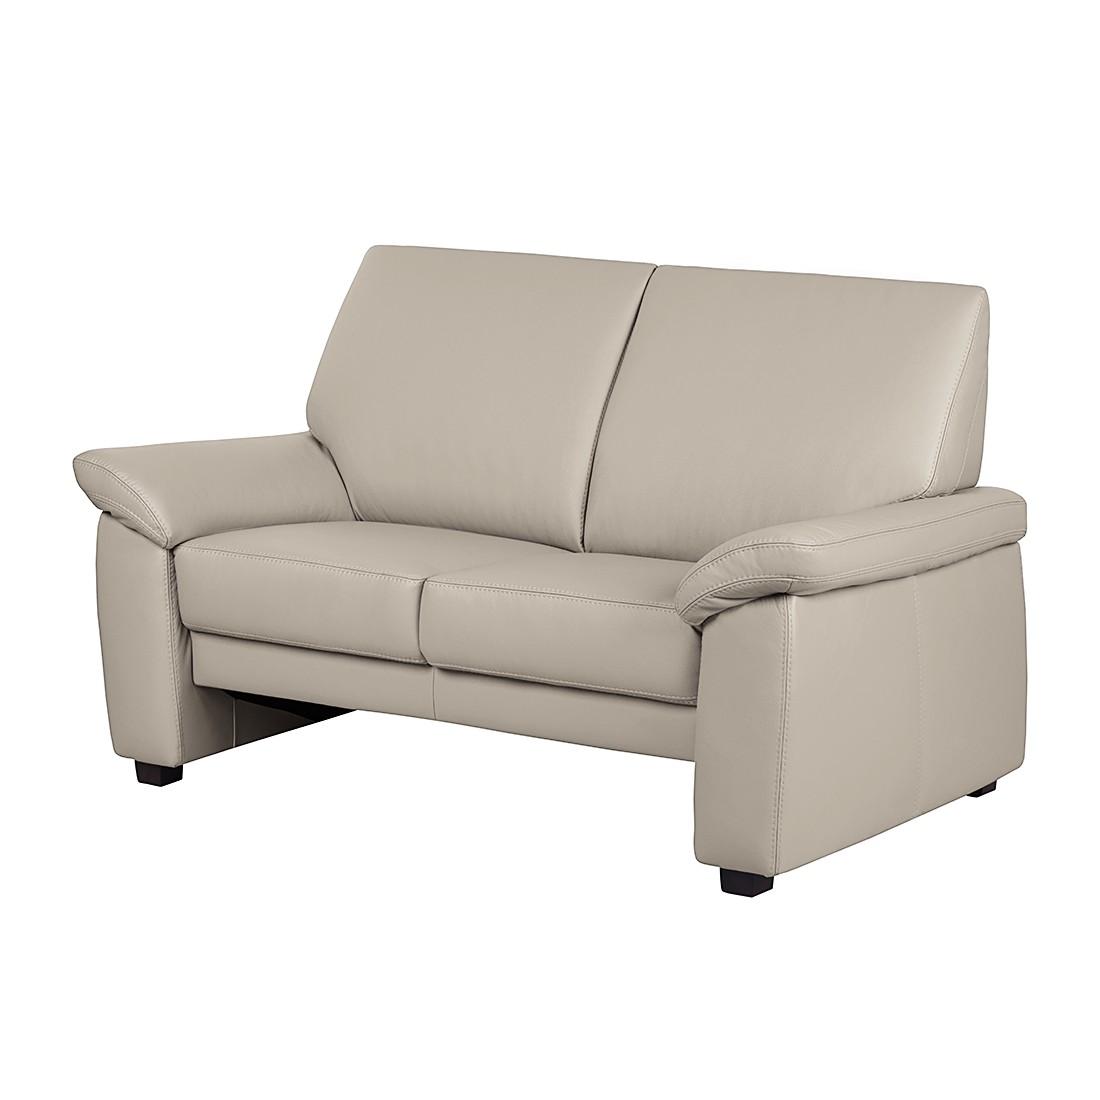 Sofa Grimsby (2-Sitzer)